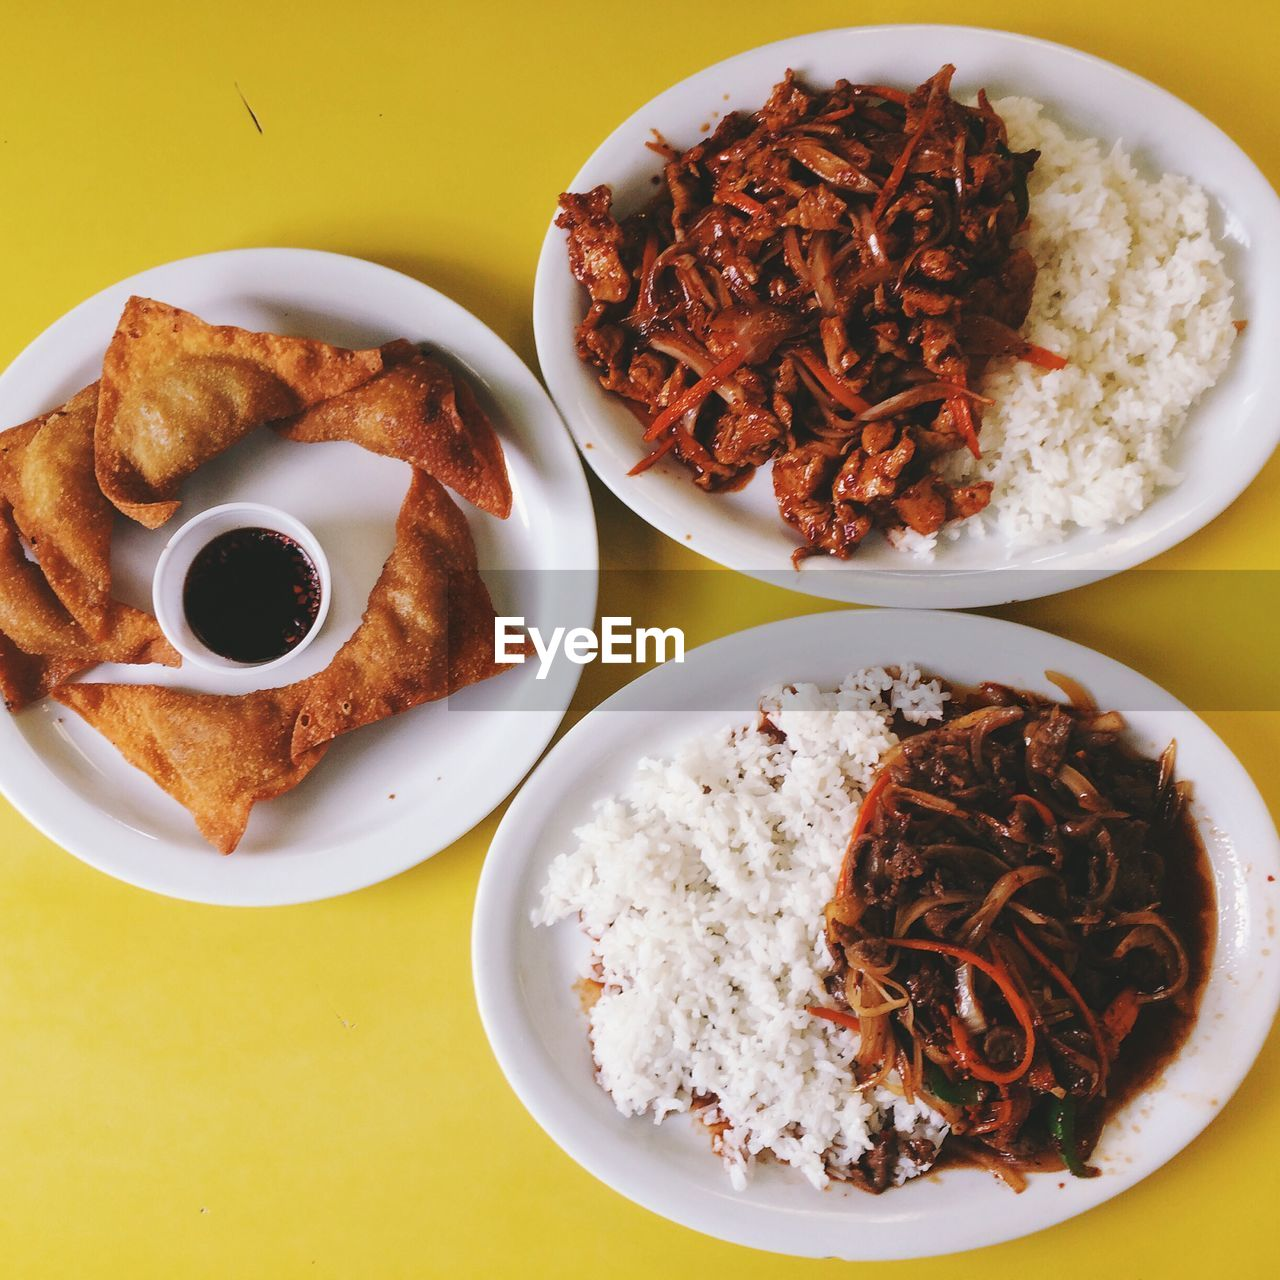 Korean Beef And Chicken Bulgogi Served On Plate